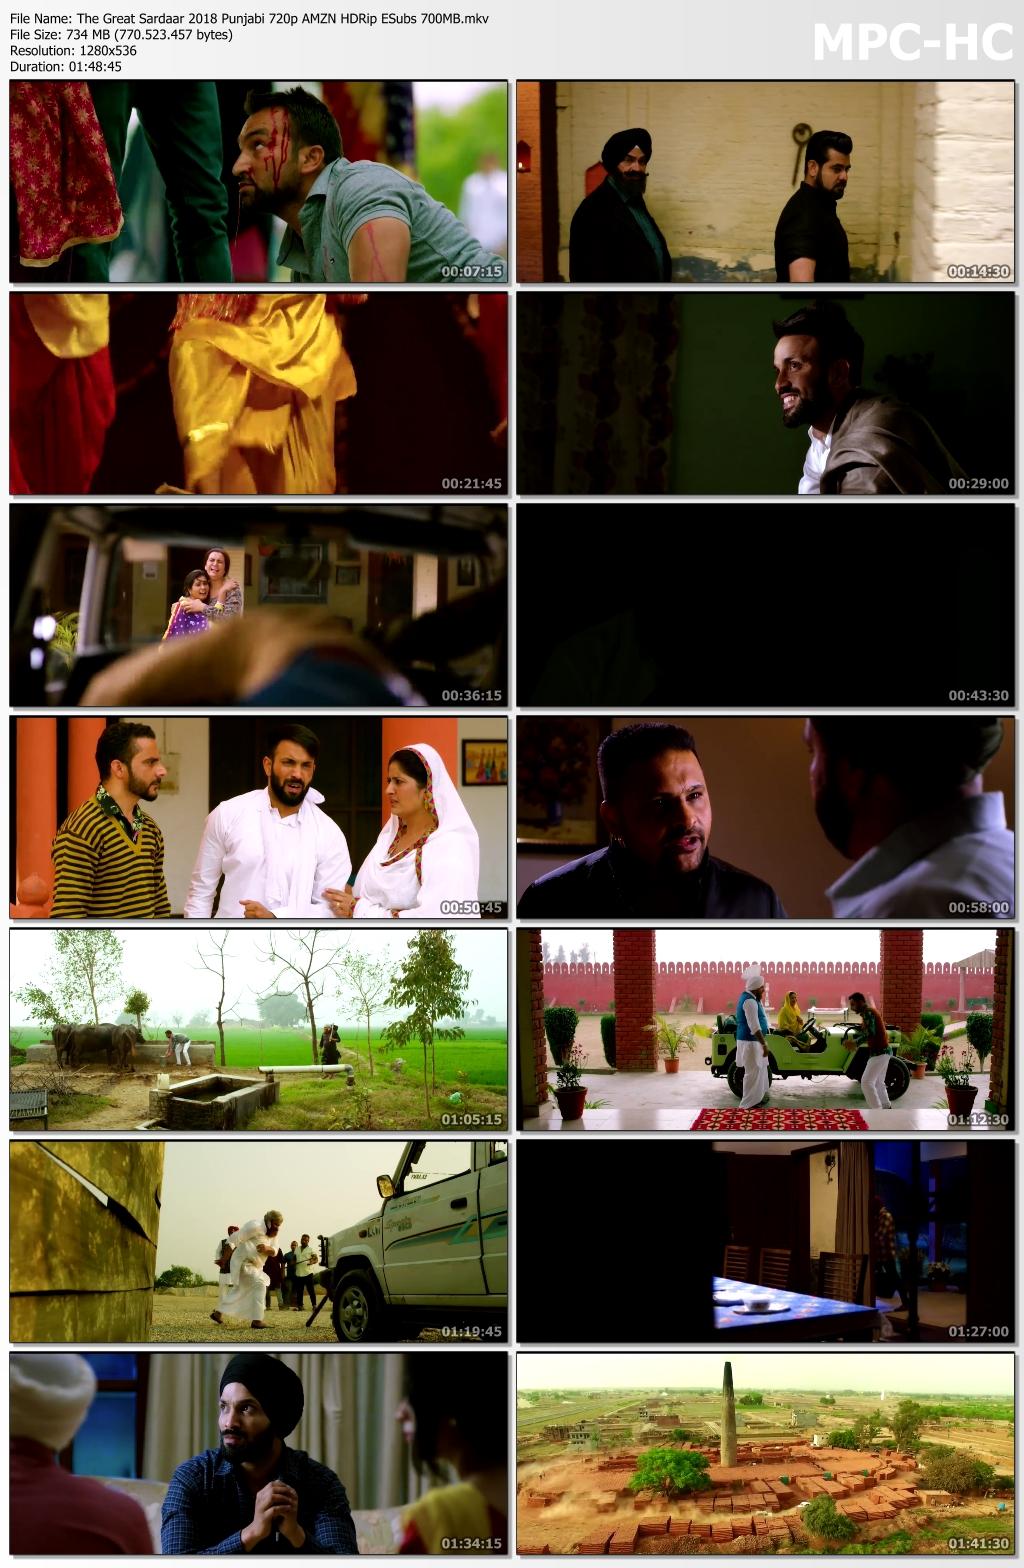 The-Great-Sardaar-2018-Punjabi-720p-AMZN-HDRip-ESubs-700-MB-mkv-thumbs